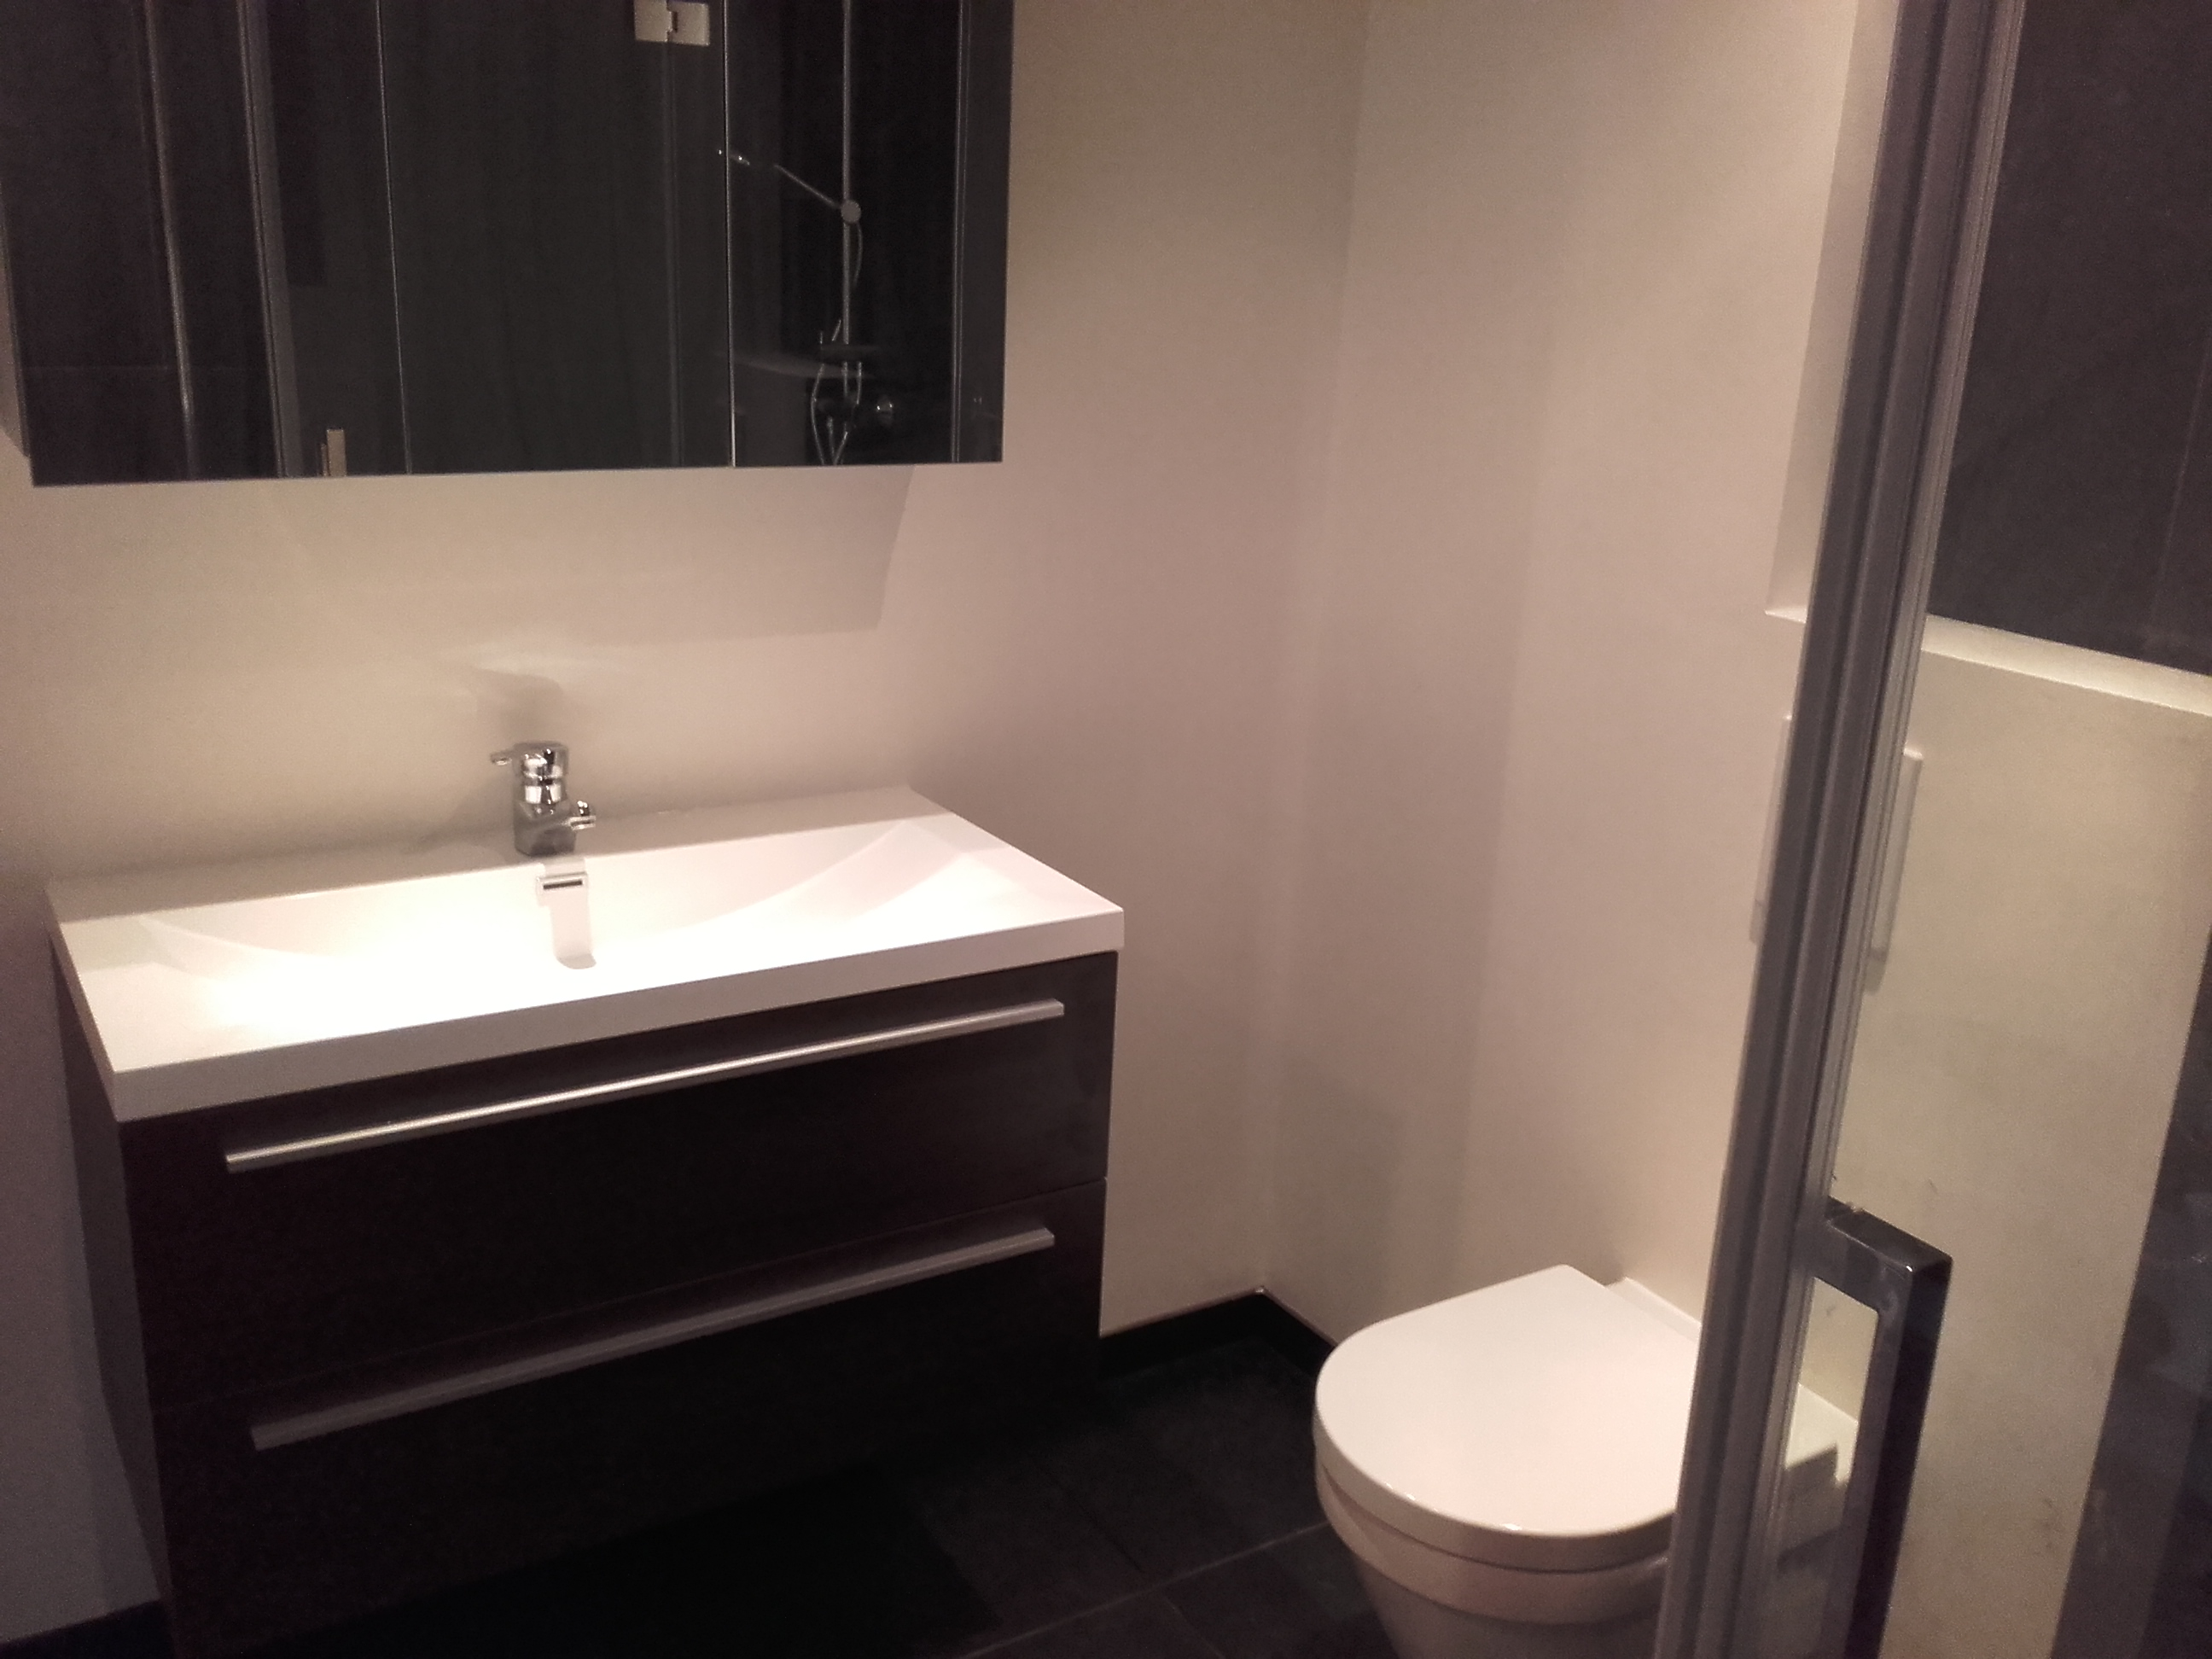 Kwaliteit badkamermeubel ikea badkamer ontwerp idee n voor uw huis samen met - Badkamer meubilair ontwerp ...